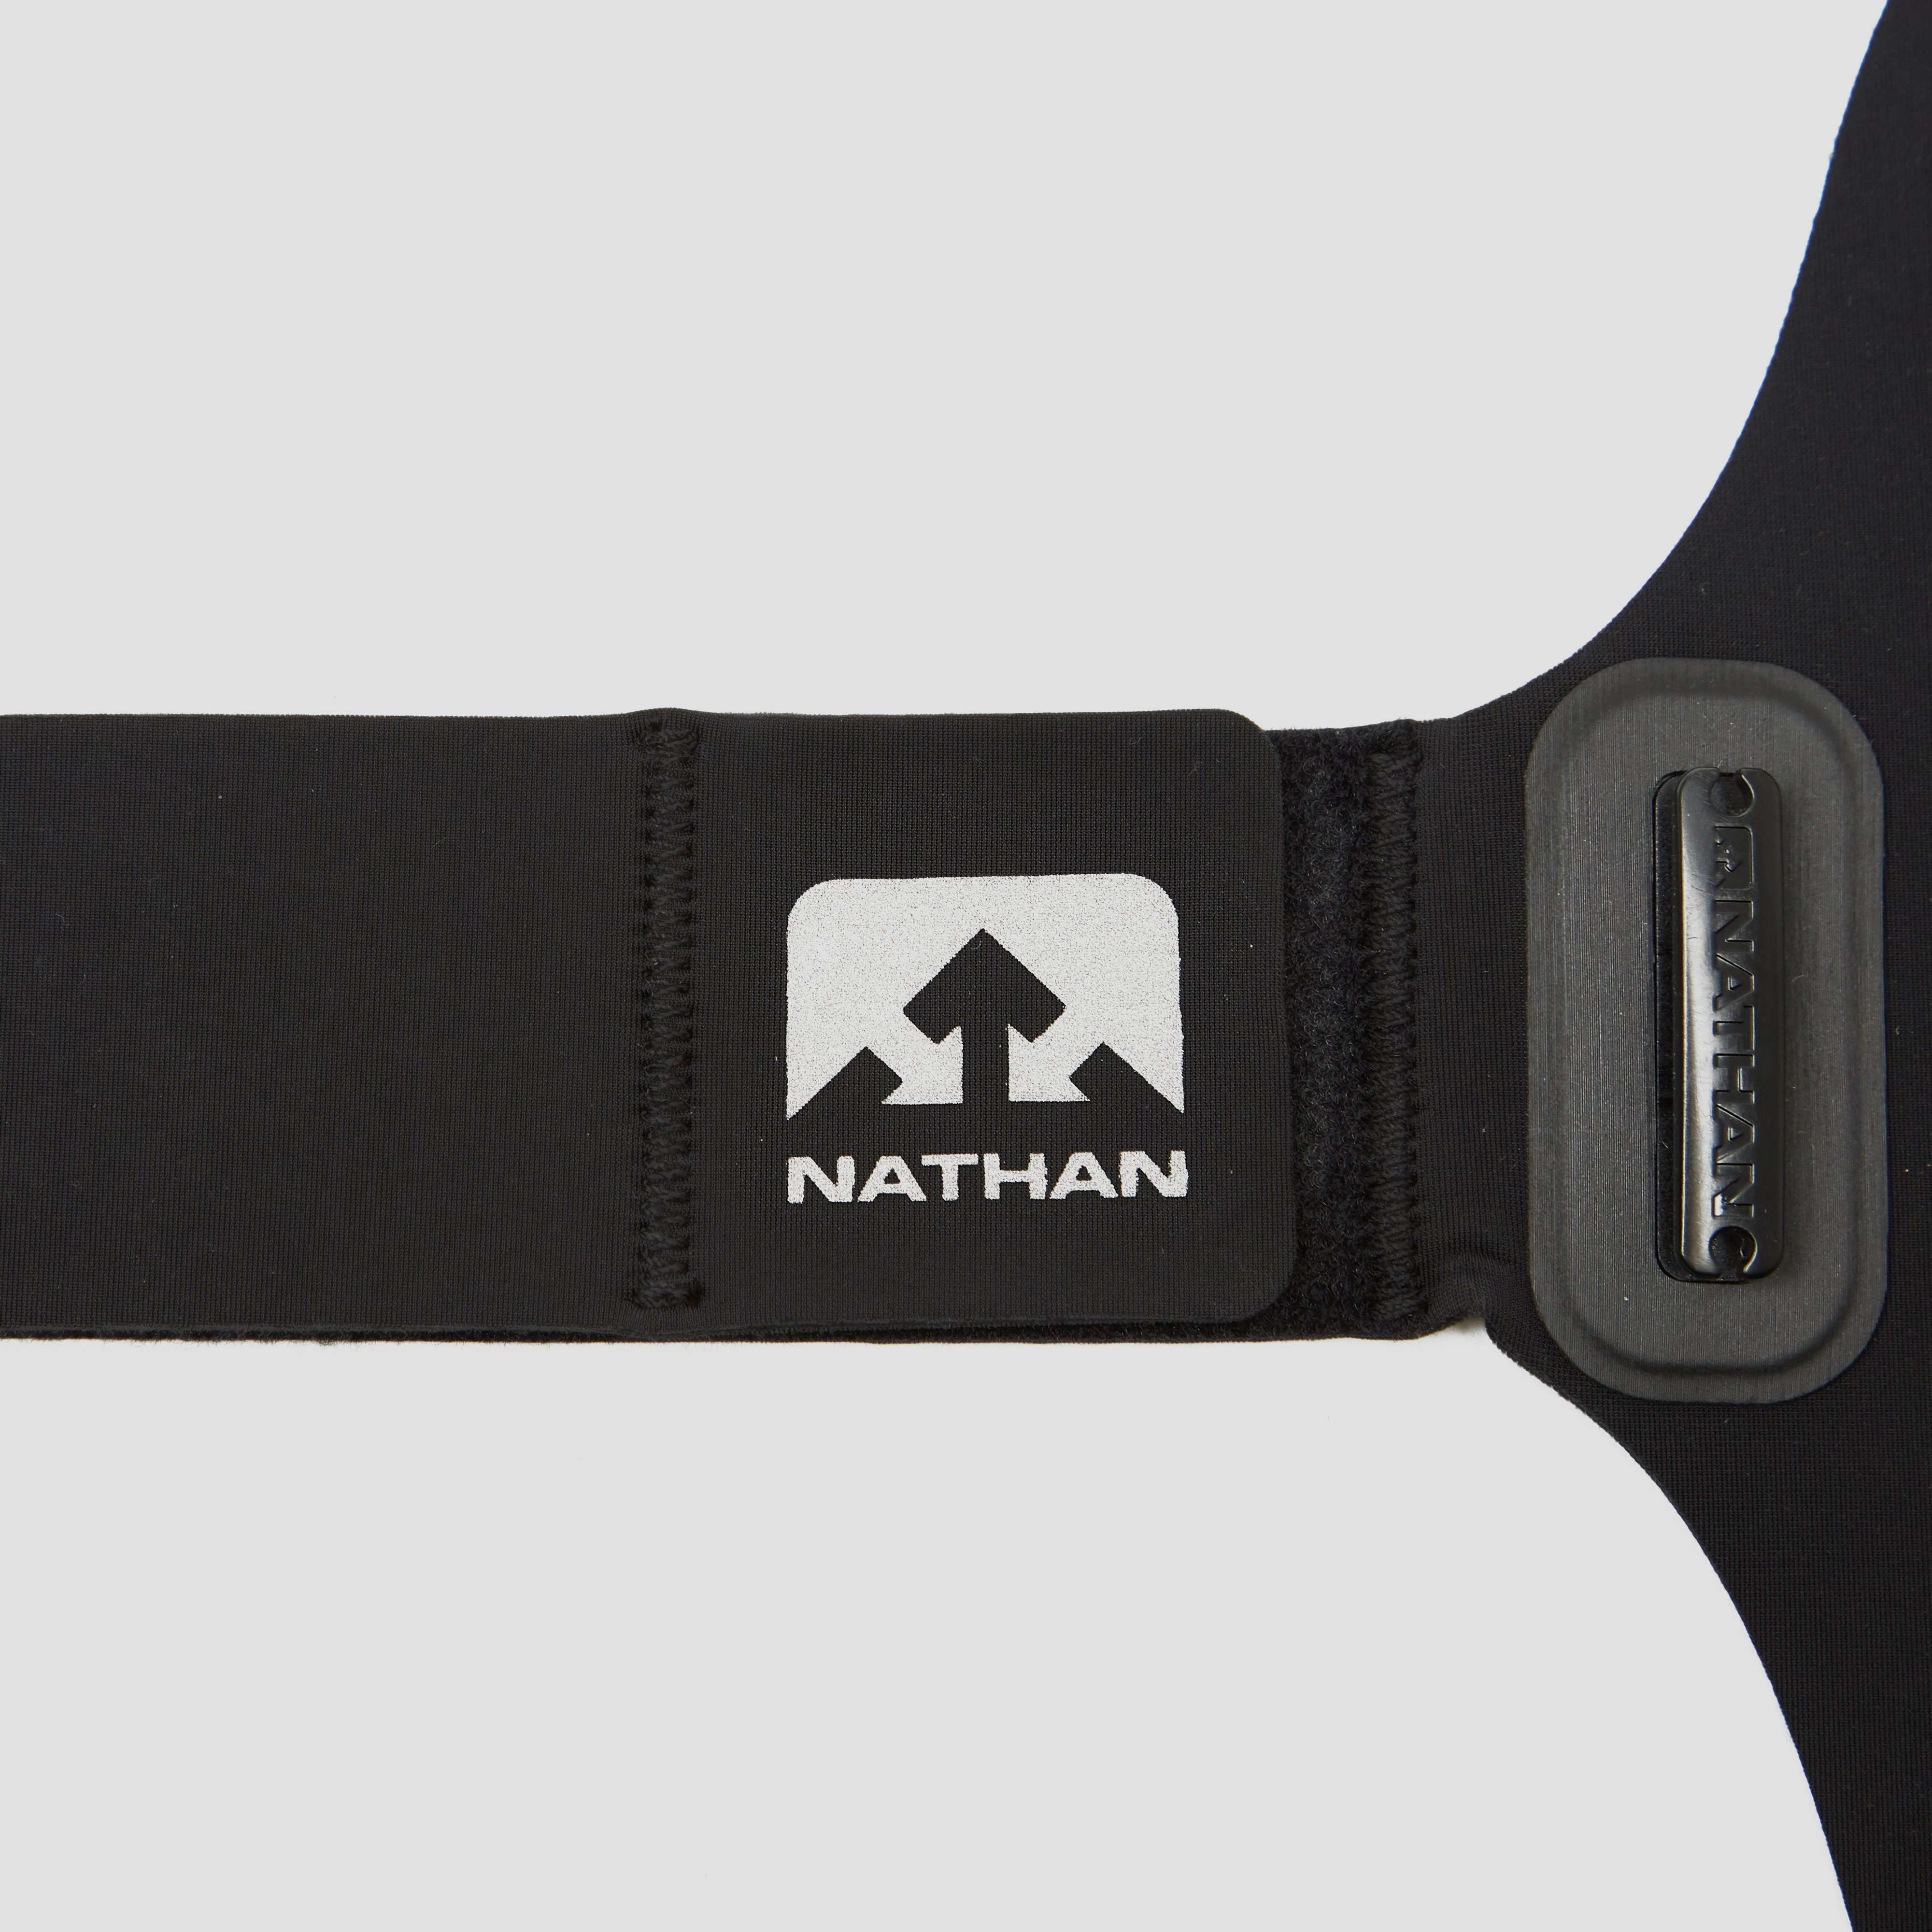 NATHAN STRIDESPORT HARDLOOP TELEFOONHOUDER ZWART